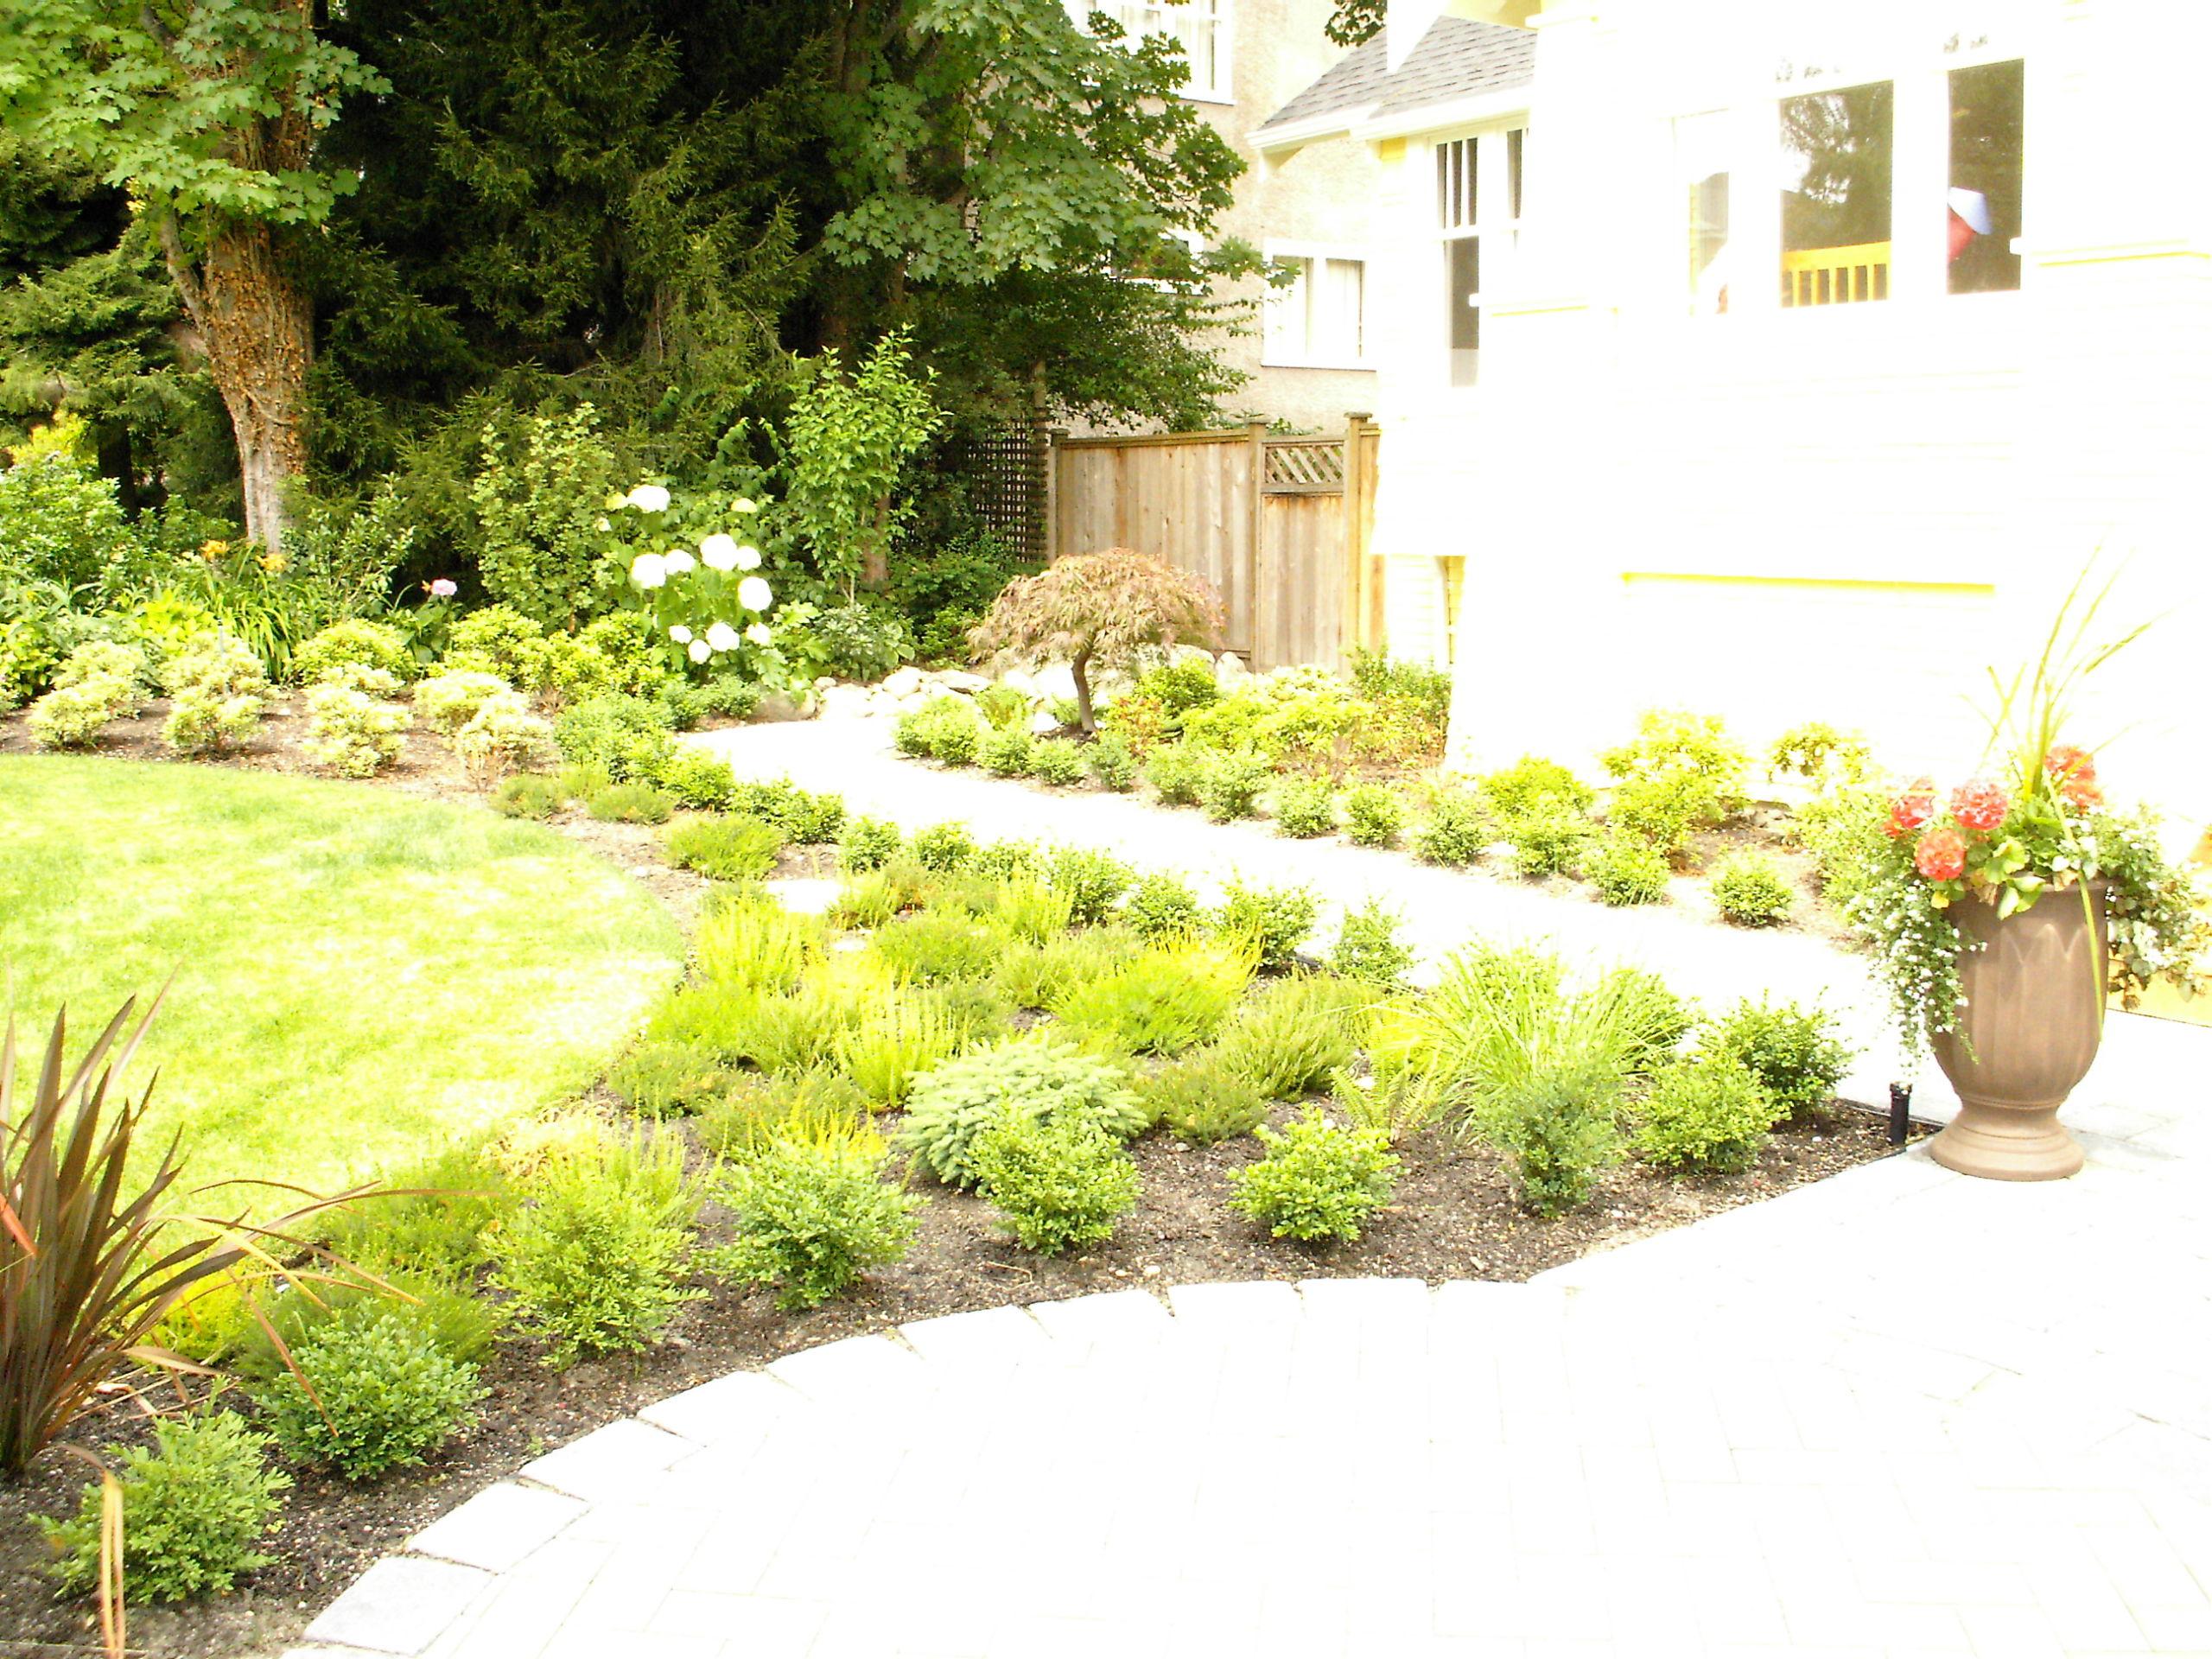 lawn & garden construction - residential landscaping